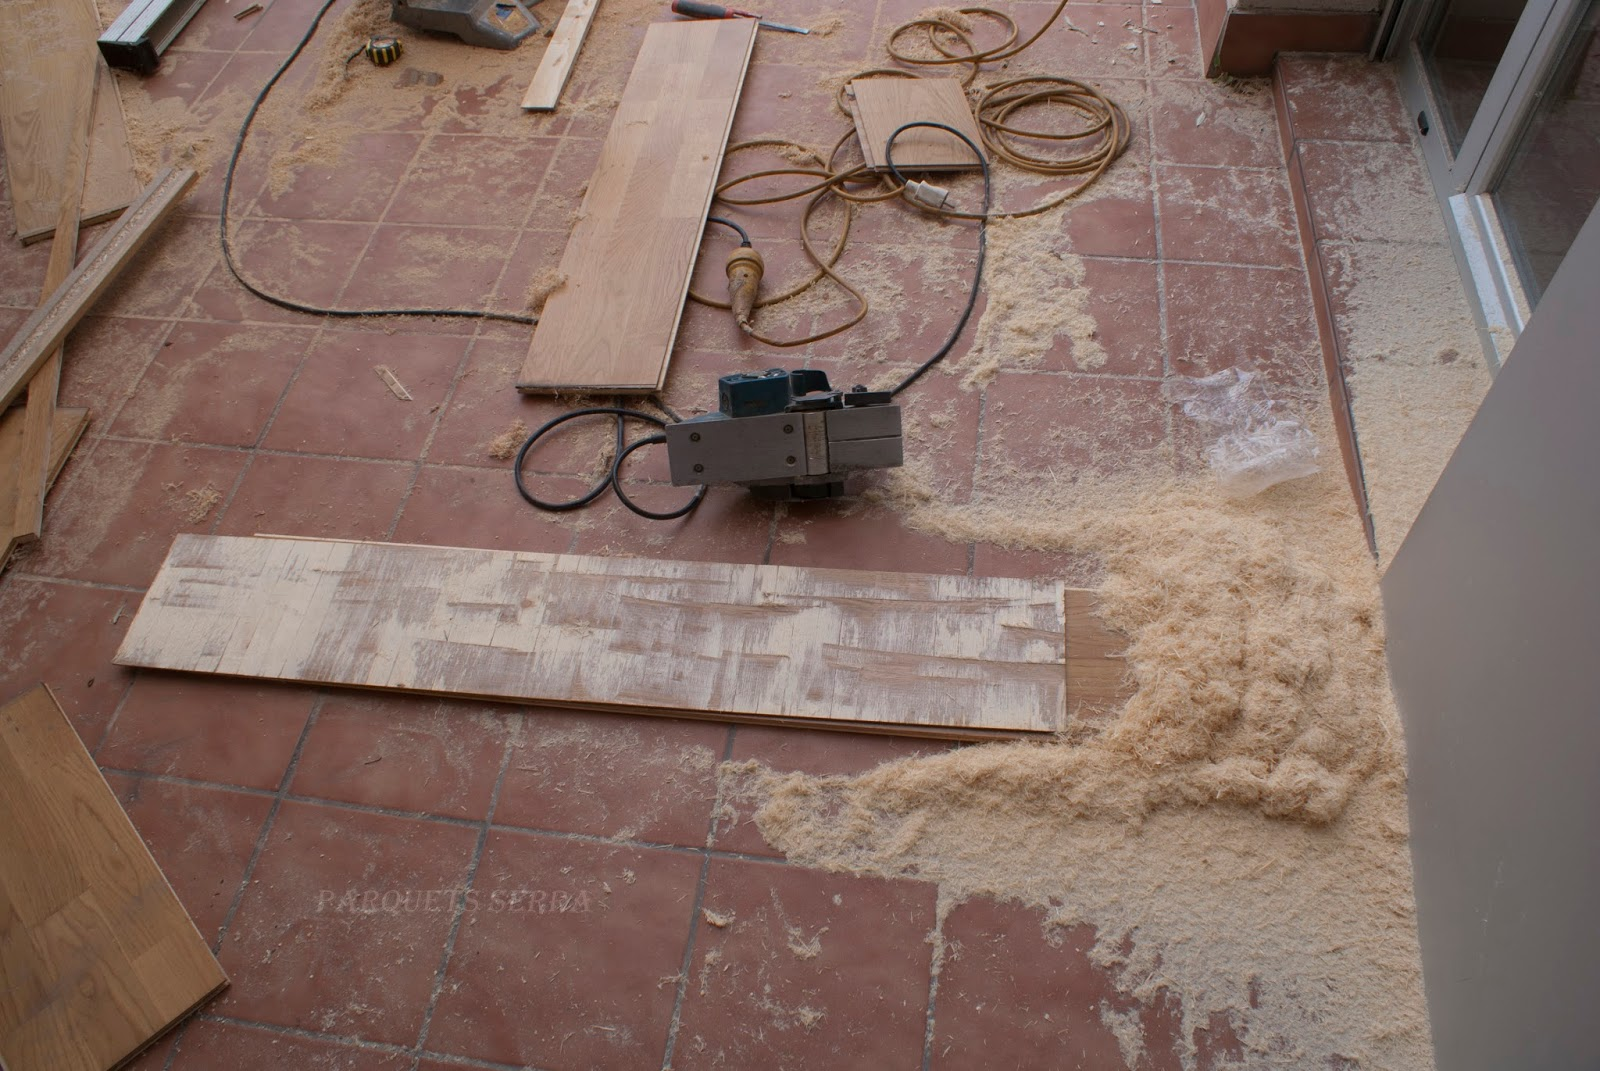 Como arreglar parquet tarima flotante abombada agujero - Como reparar piso de parquet rayado ...